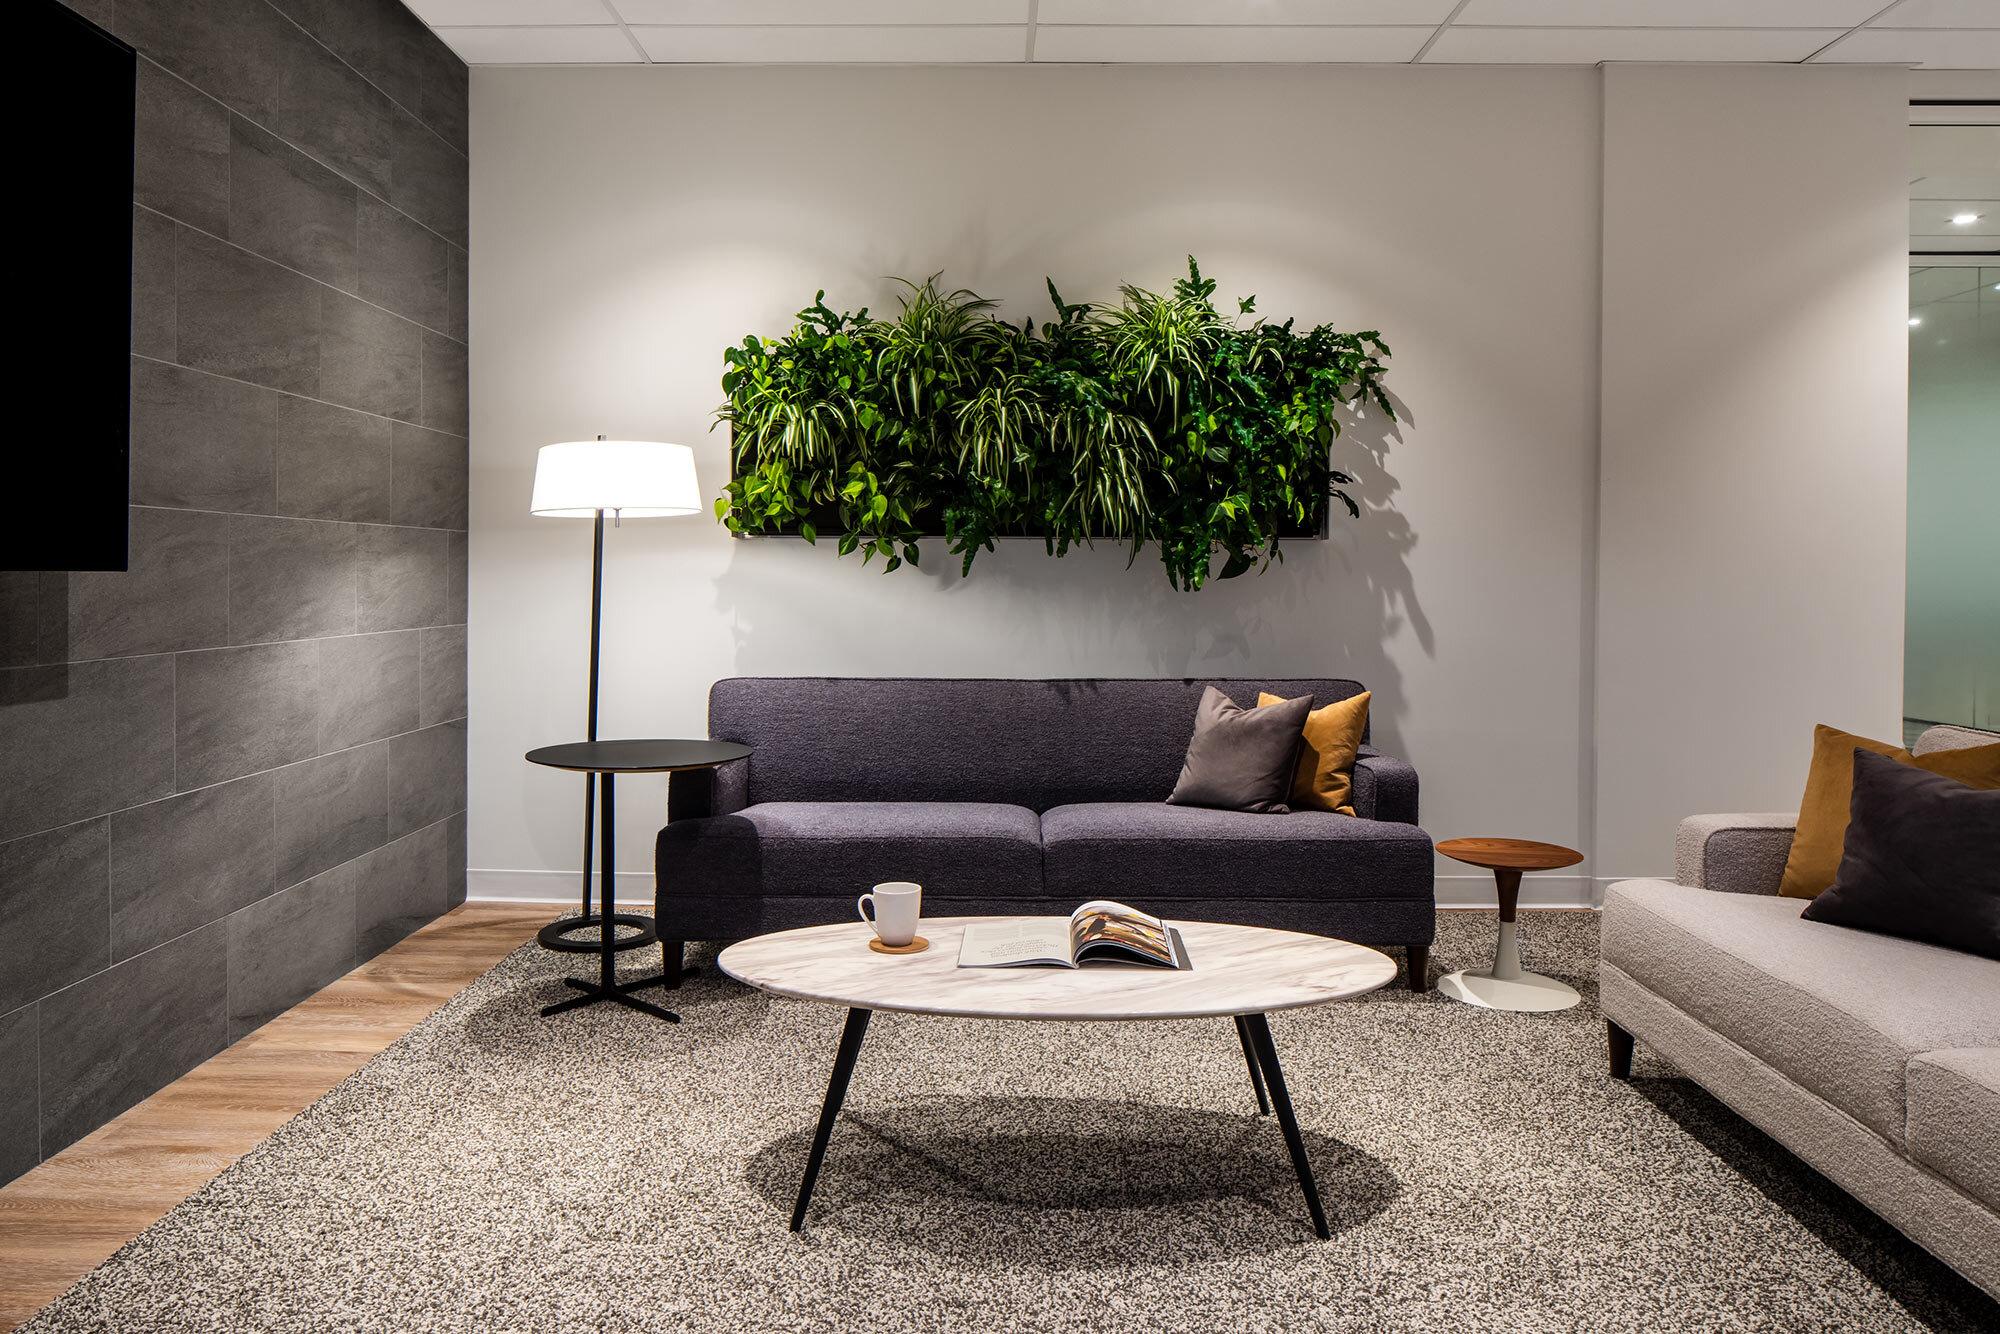 Insurance-interior-design-office-common-area-plant-wall.jpg